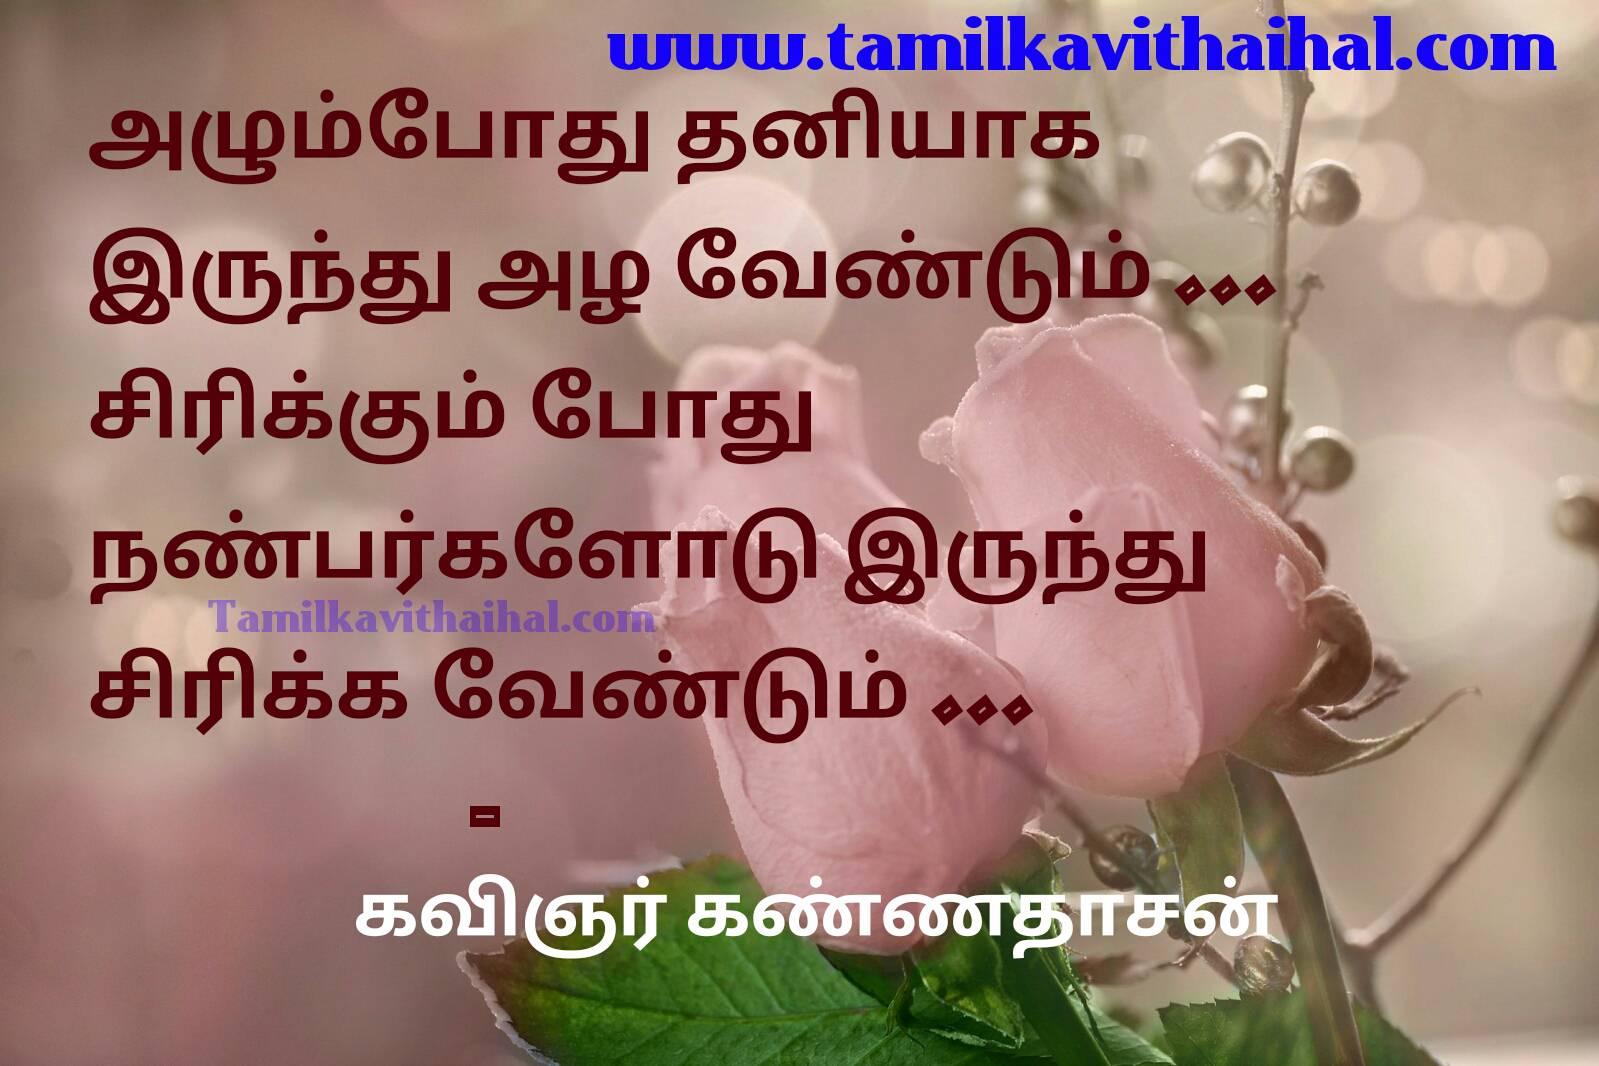 Kaviarasu kannadasan tamil kavithaigal valkkai thathuvam alukai sirippu nanbar feel kanner hd pictures